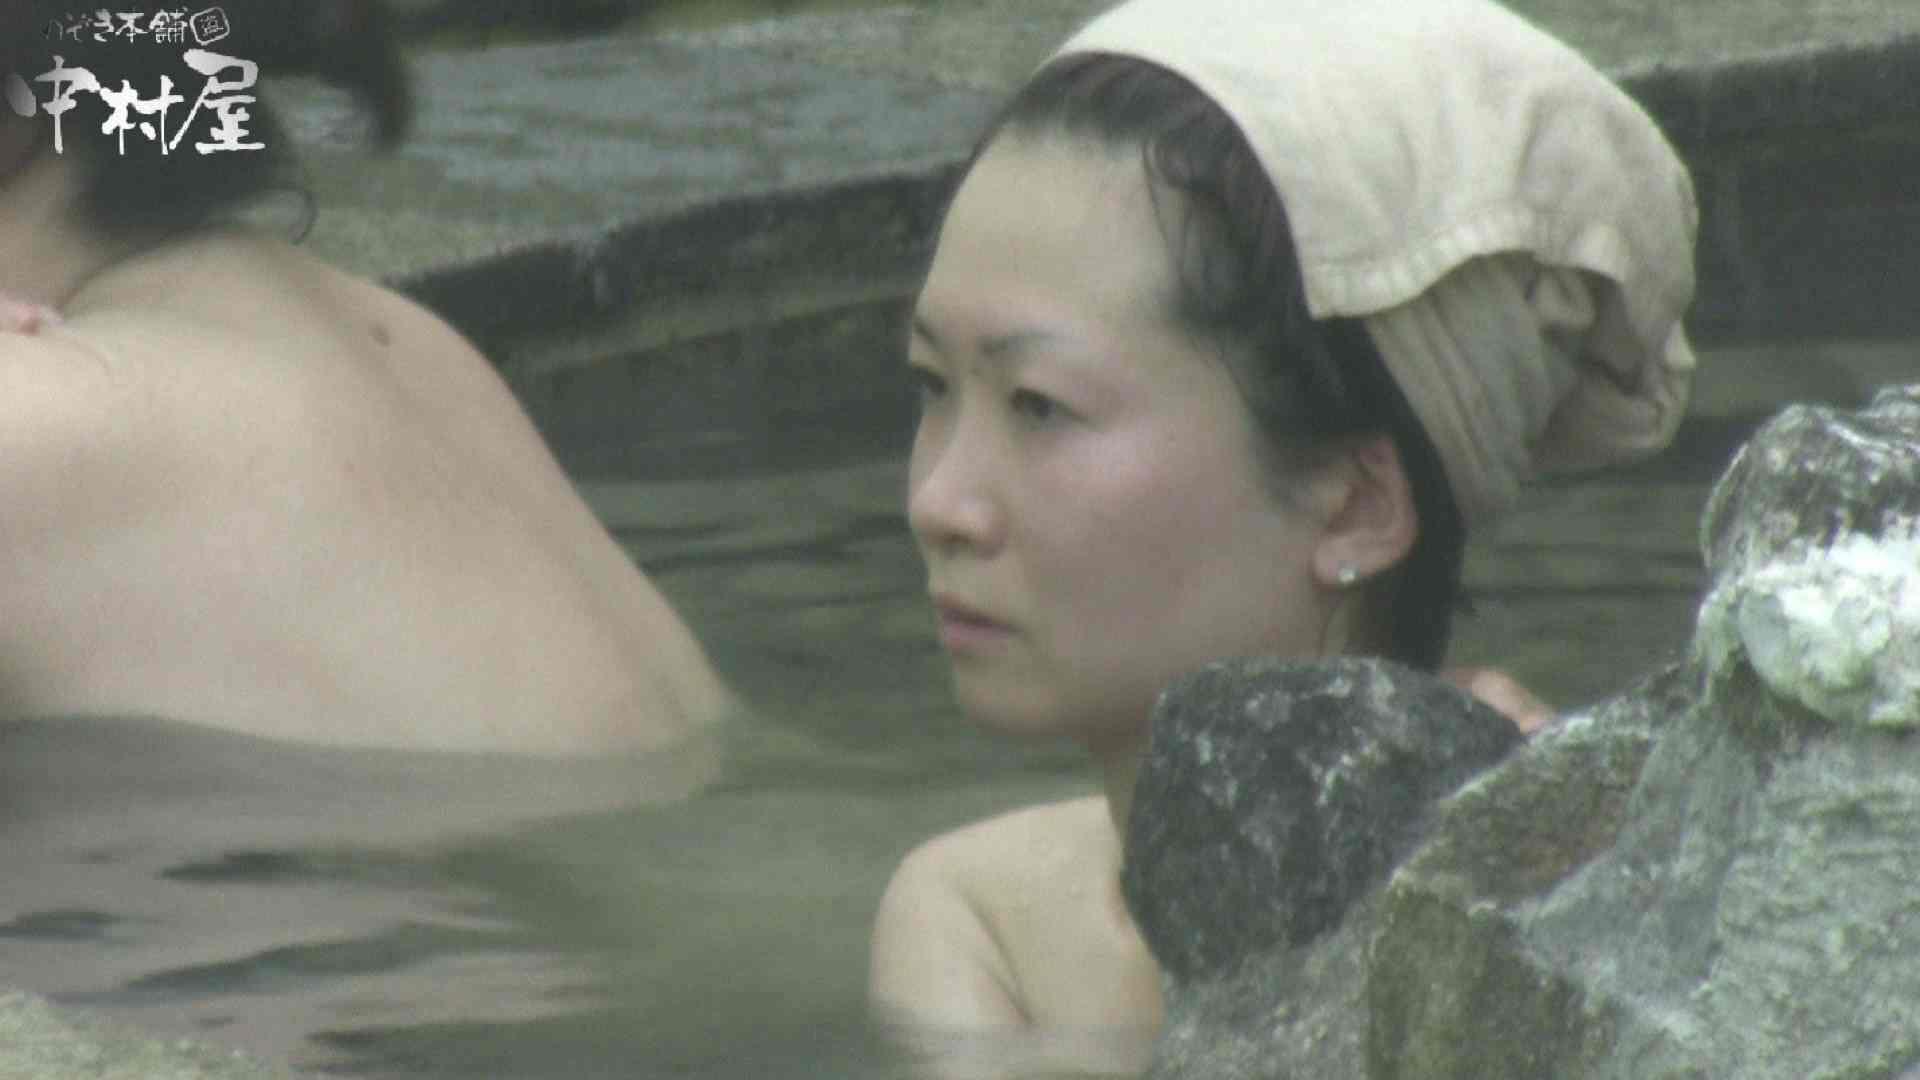 Aquaな露天風呂Vol.906 露天風呂編 | 盗撮シリーズ  86PIX 81